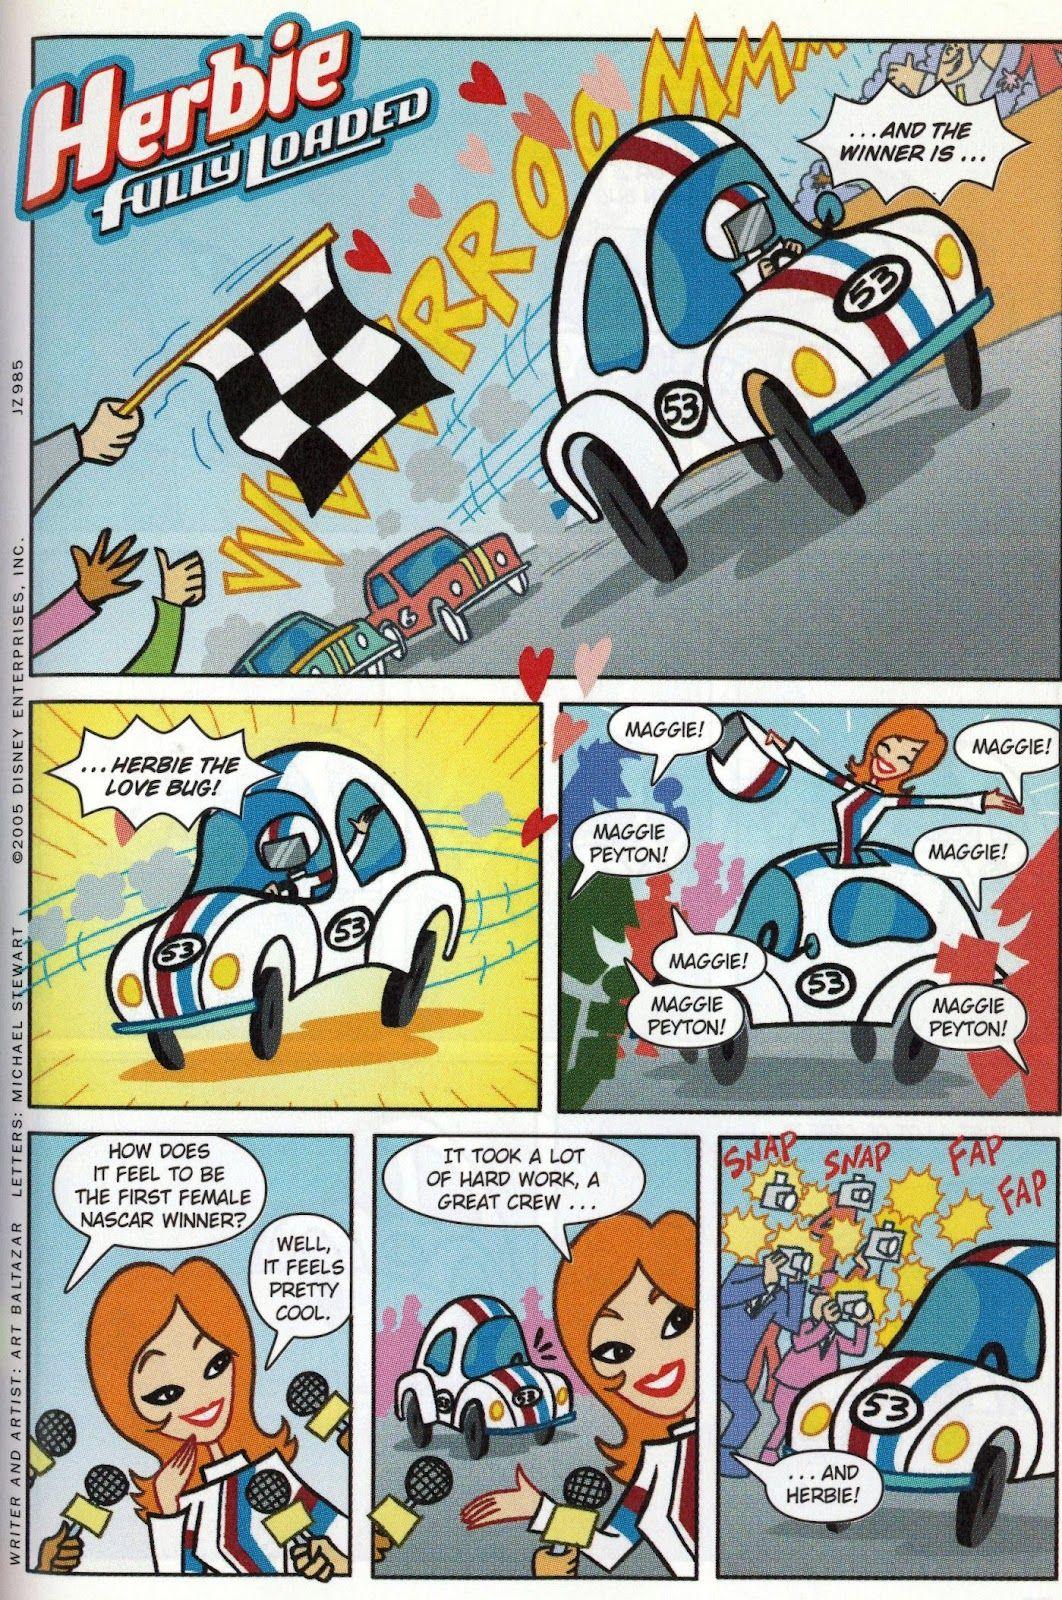 Herbie Fully Loaded Comic By Art Baltazar Love Bugs Herbie Fully Loaded Character Design [ 1600 x 1062 Pixel ]